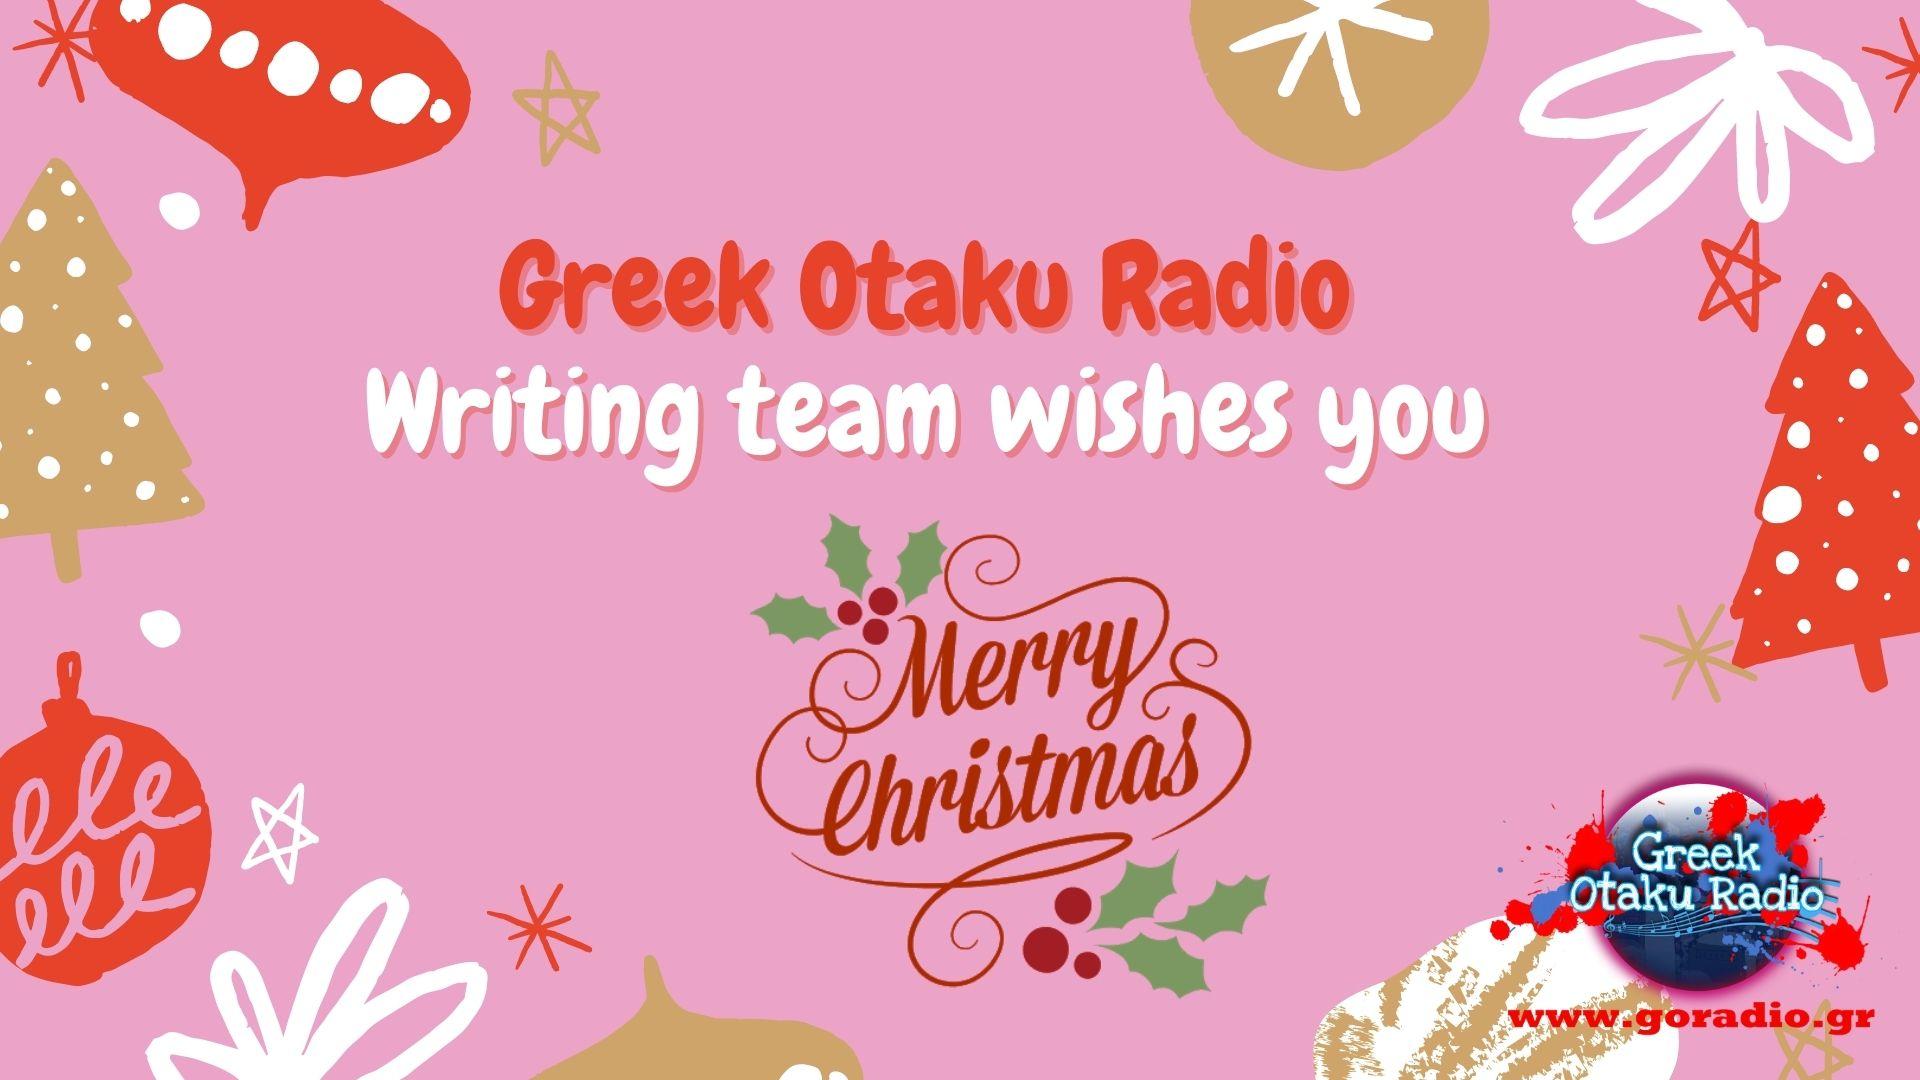 Greek Otaku Radio Writting team